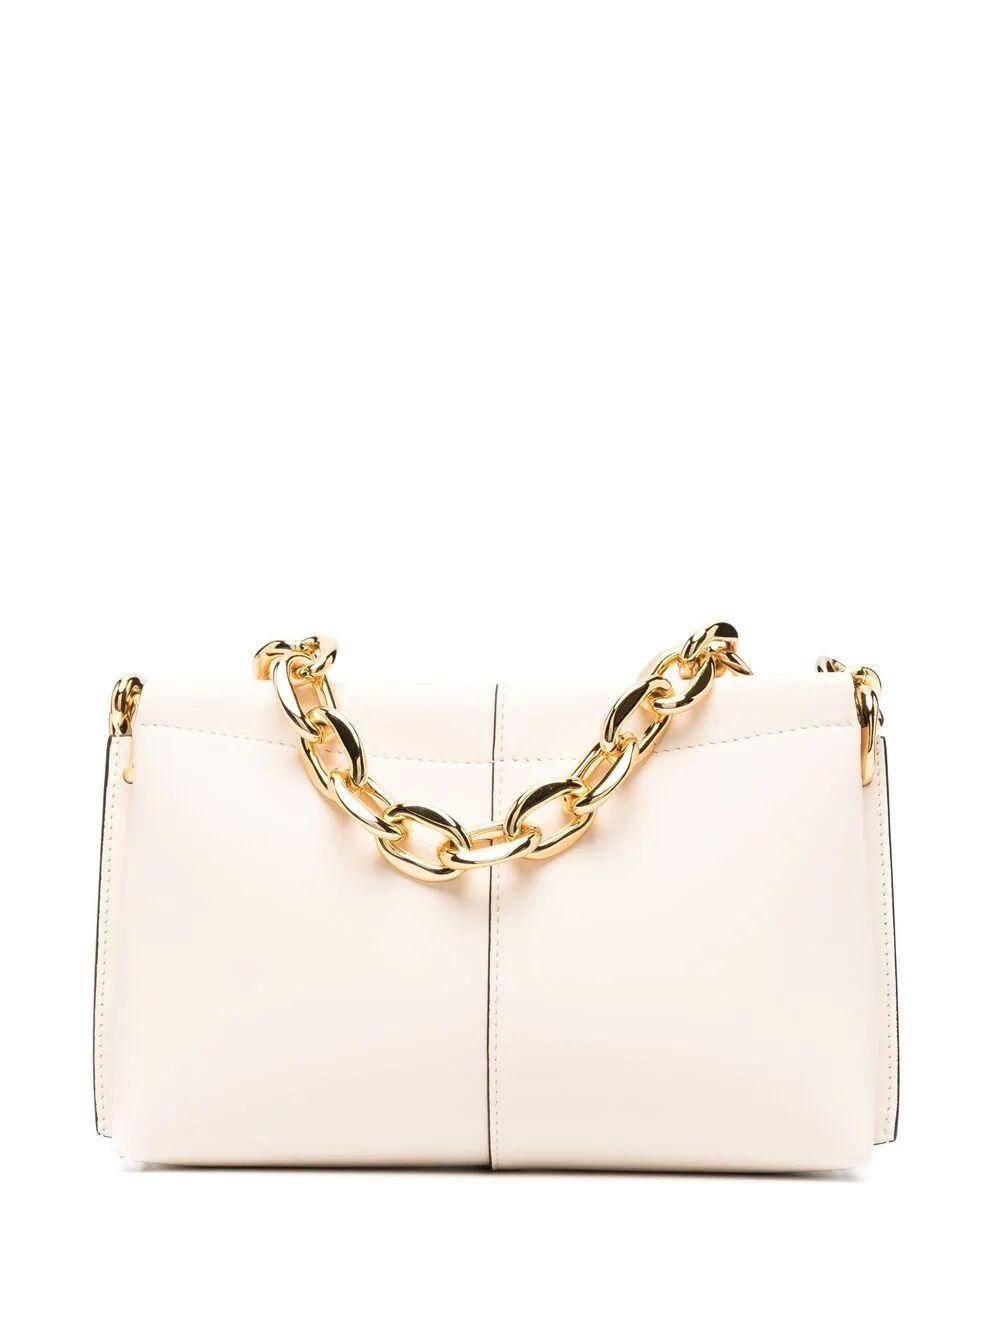 Carly Chain Strap Shoulder Bag